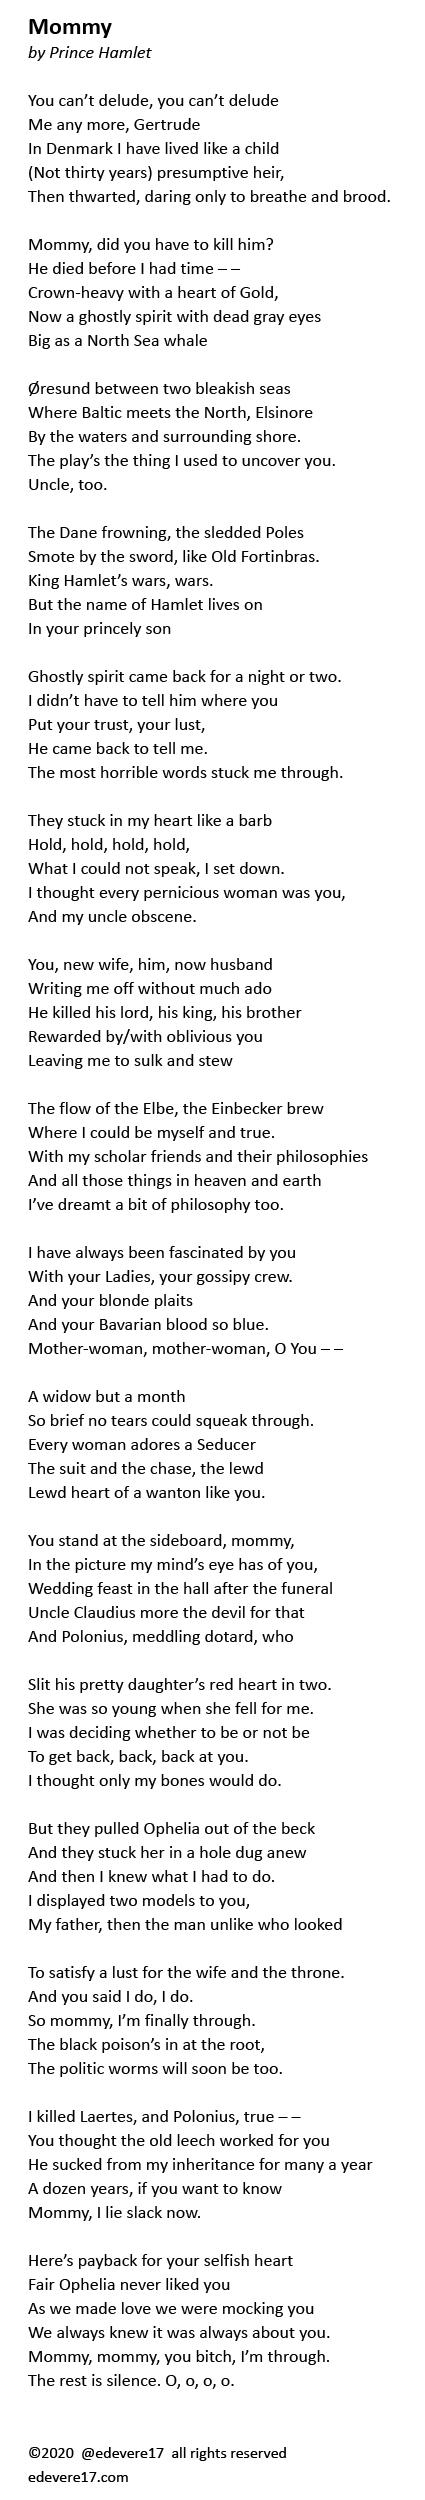 Mommy Hamlet poem after Sylvia Plath Daddy